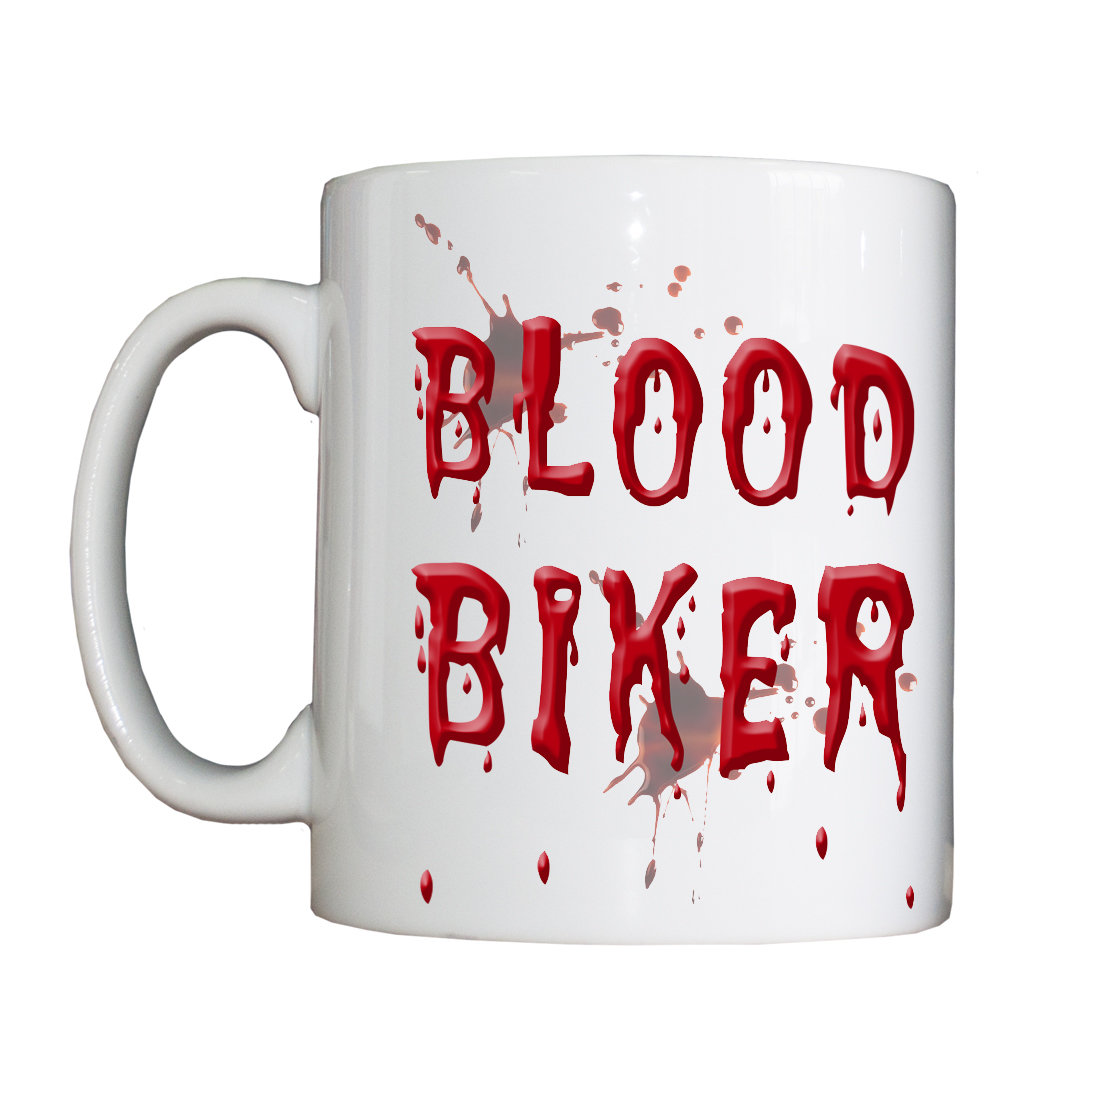 Personalised 'Blood Biker' Drinking Vessel BloodBikerVessel